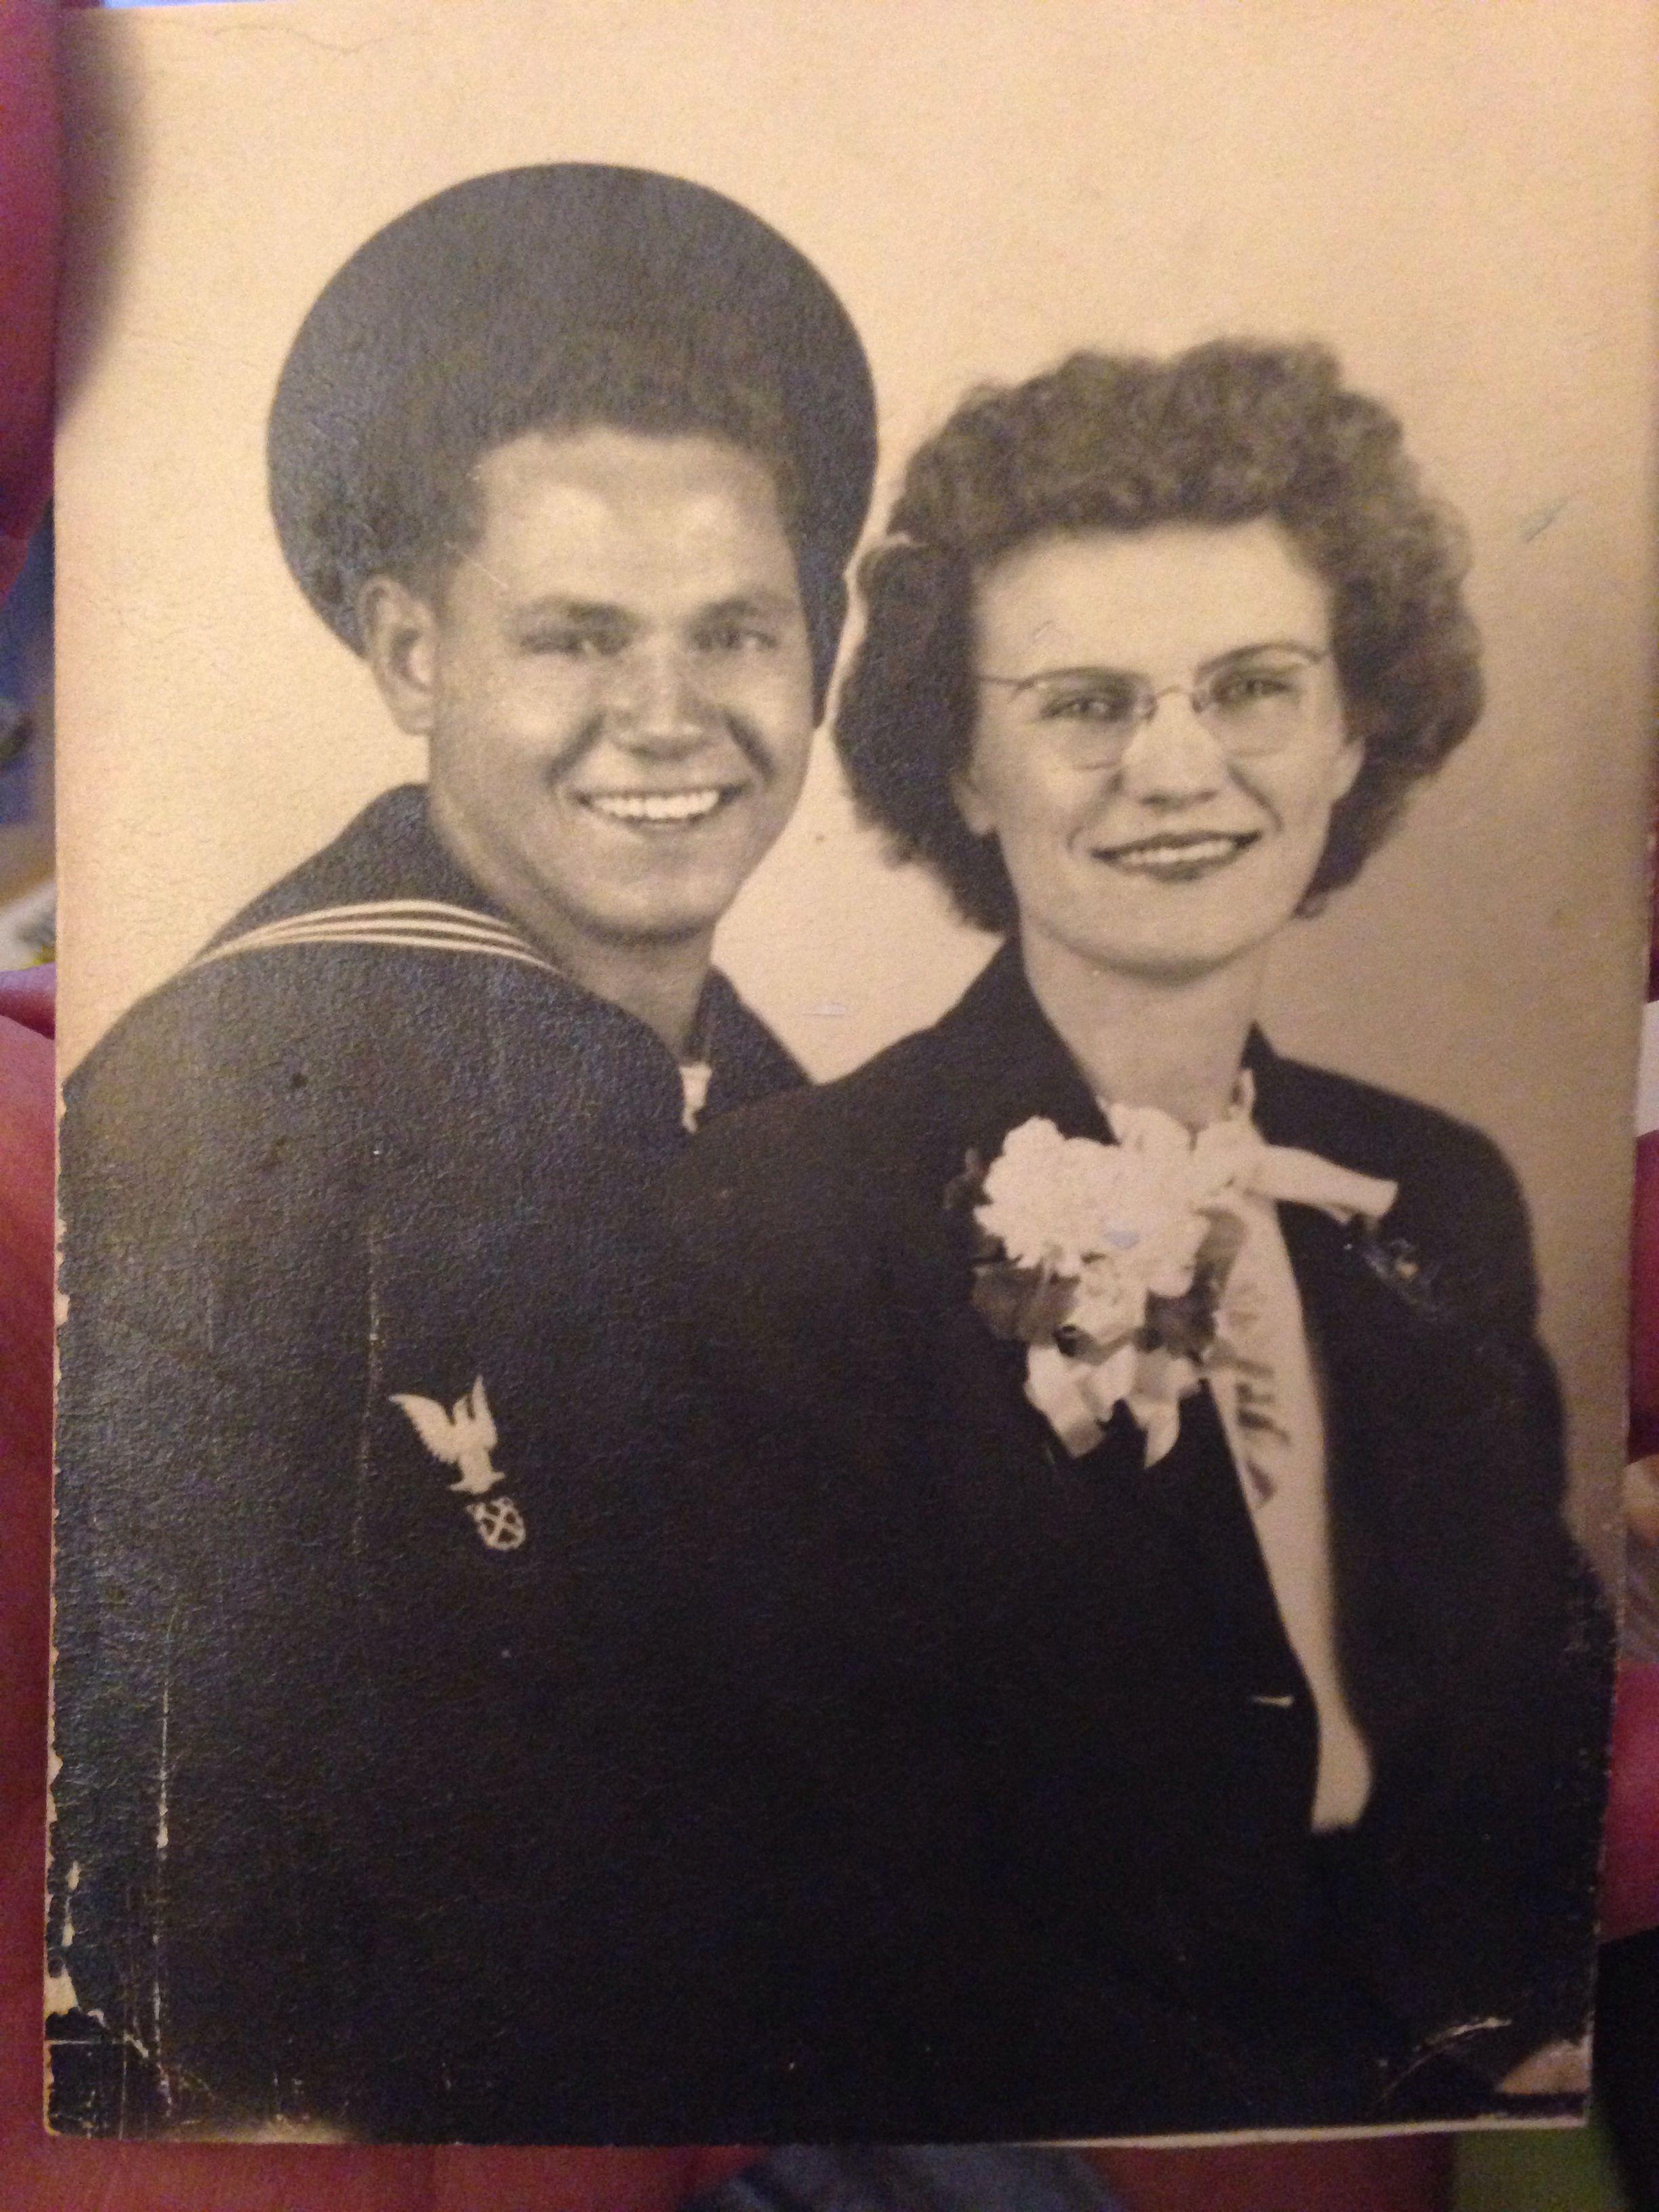 My grandparents